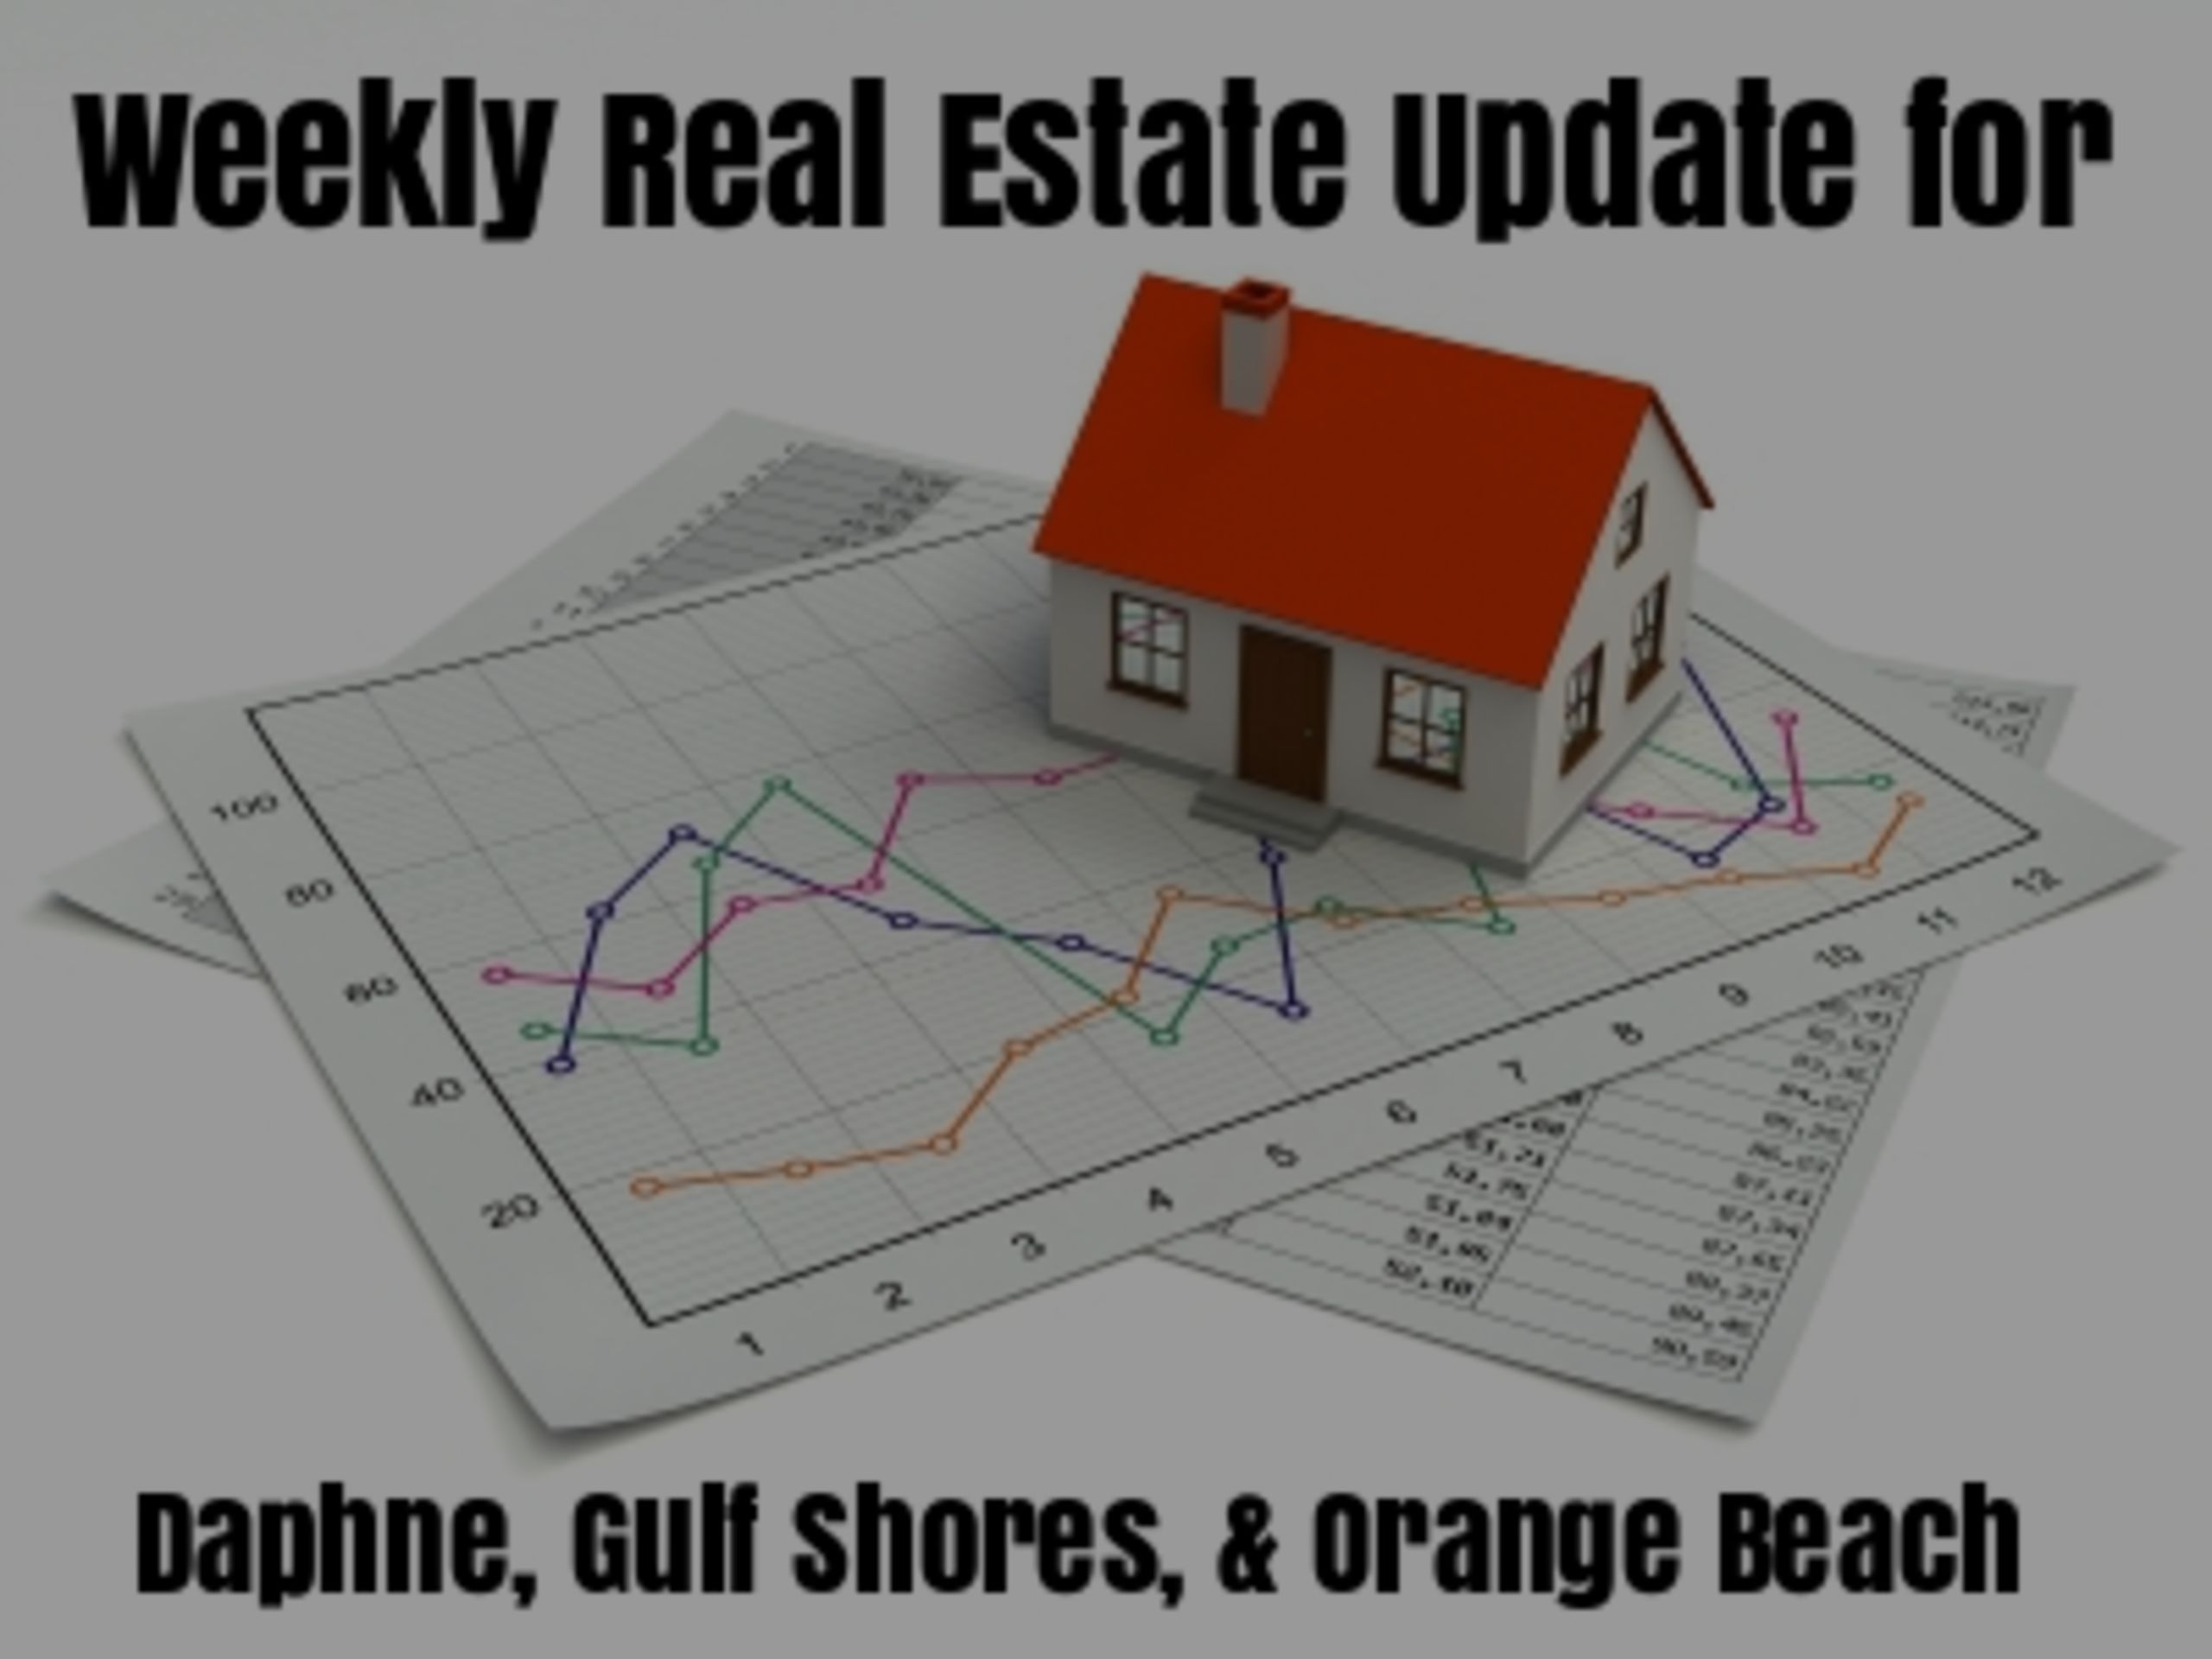 Weekly Real Estate Update – Daphne, Gulf Shores, and Orange Beach – 3/6/17